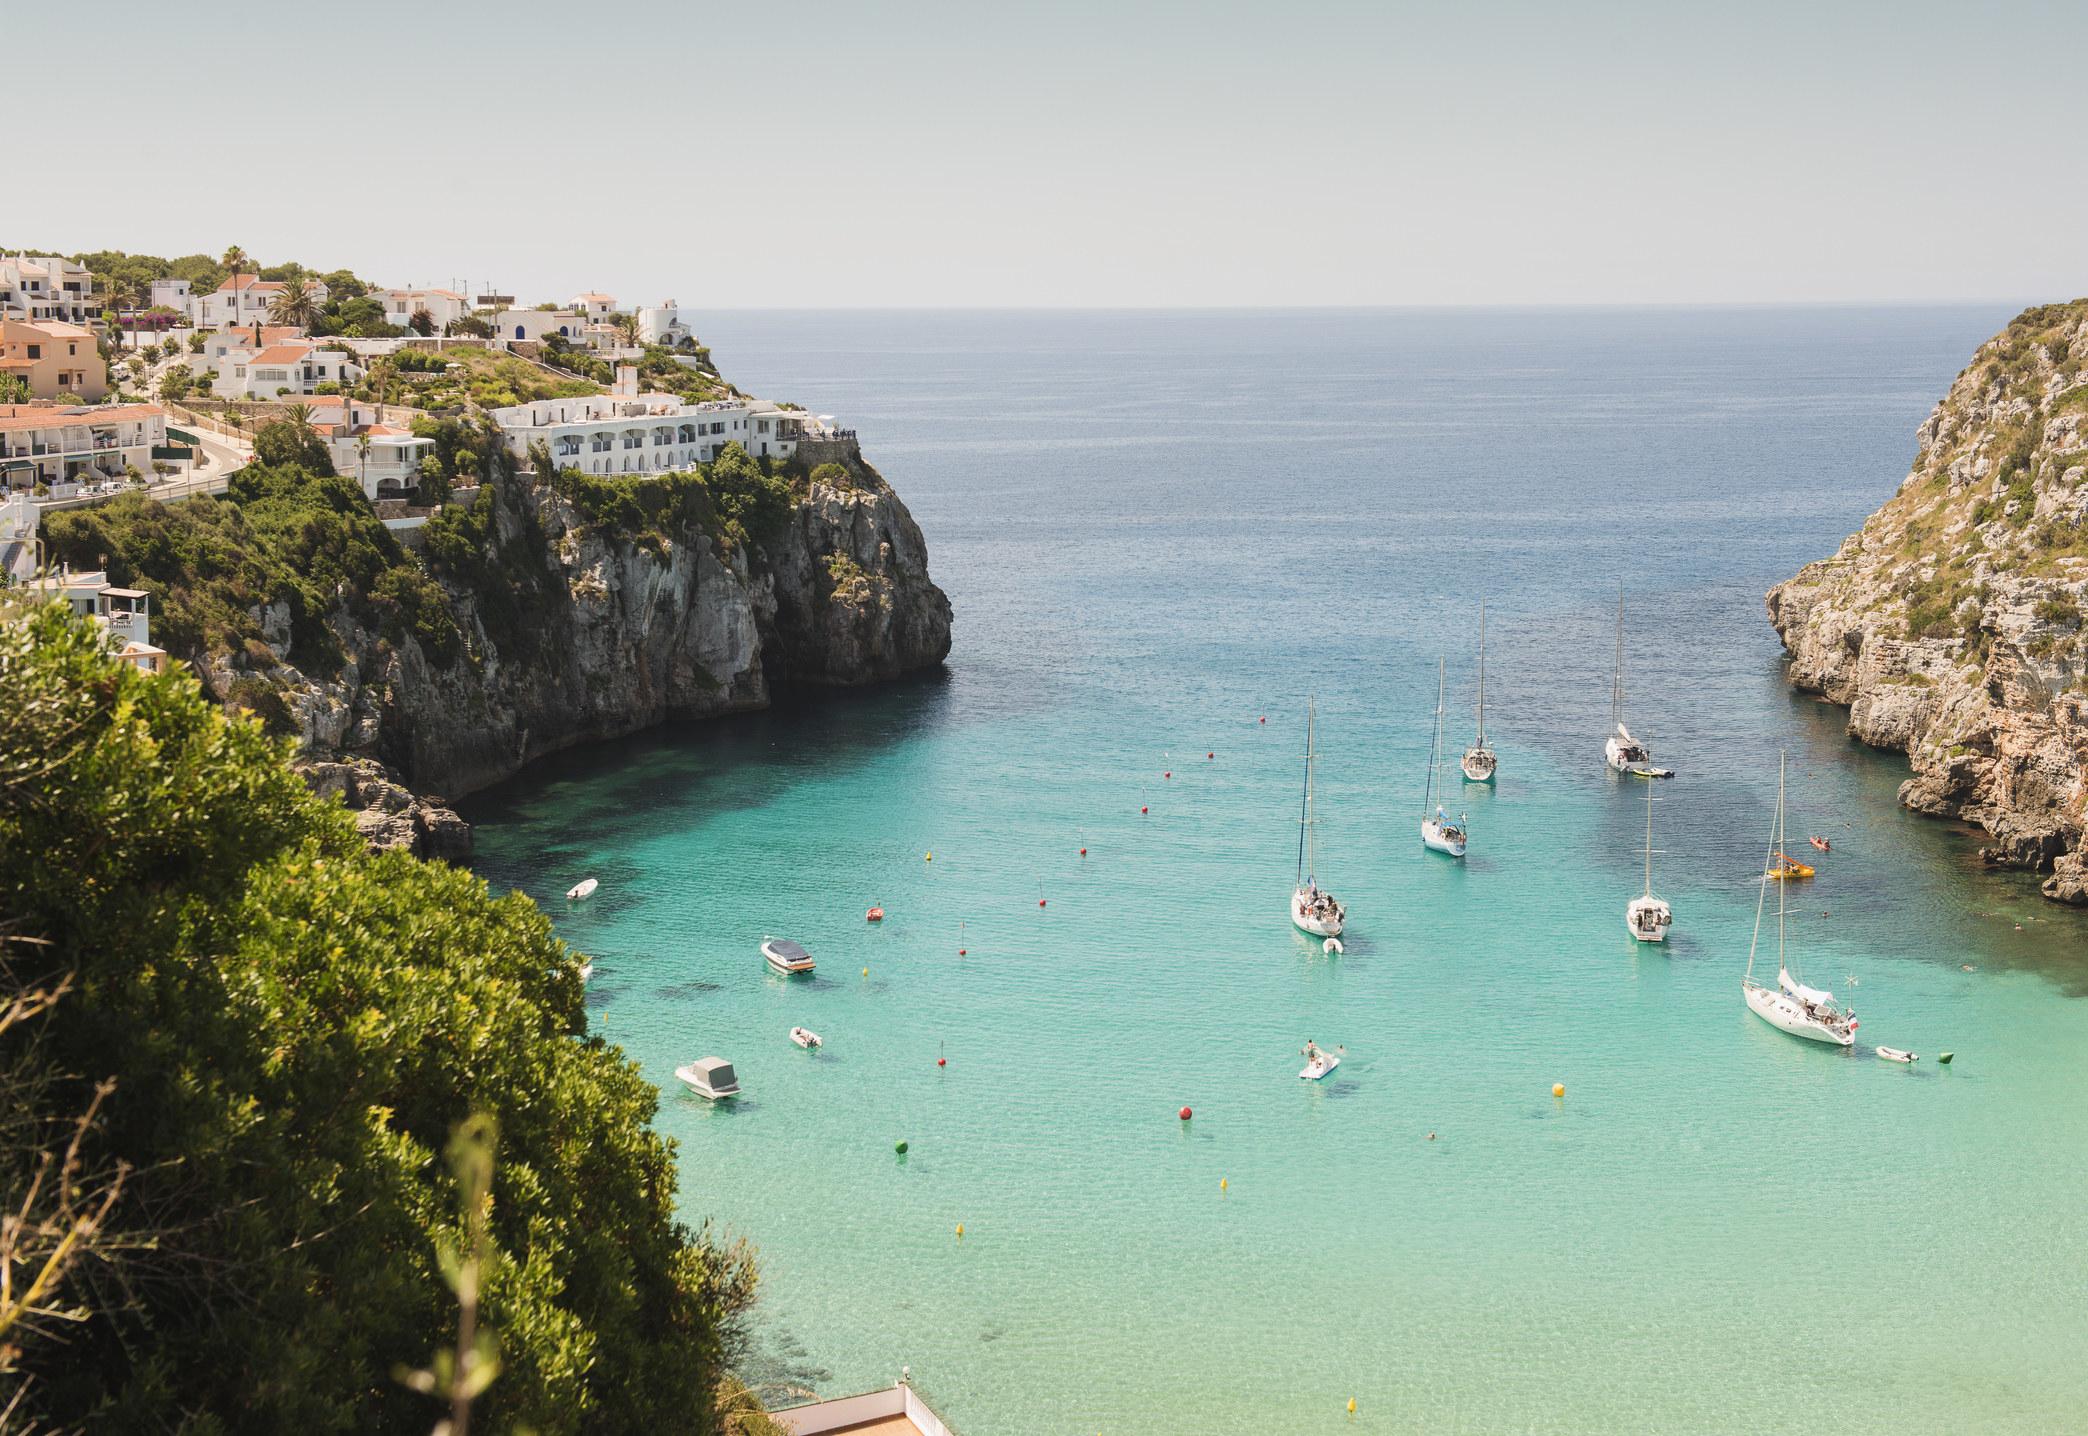 Boats in the serene blue water in Menorca.